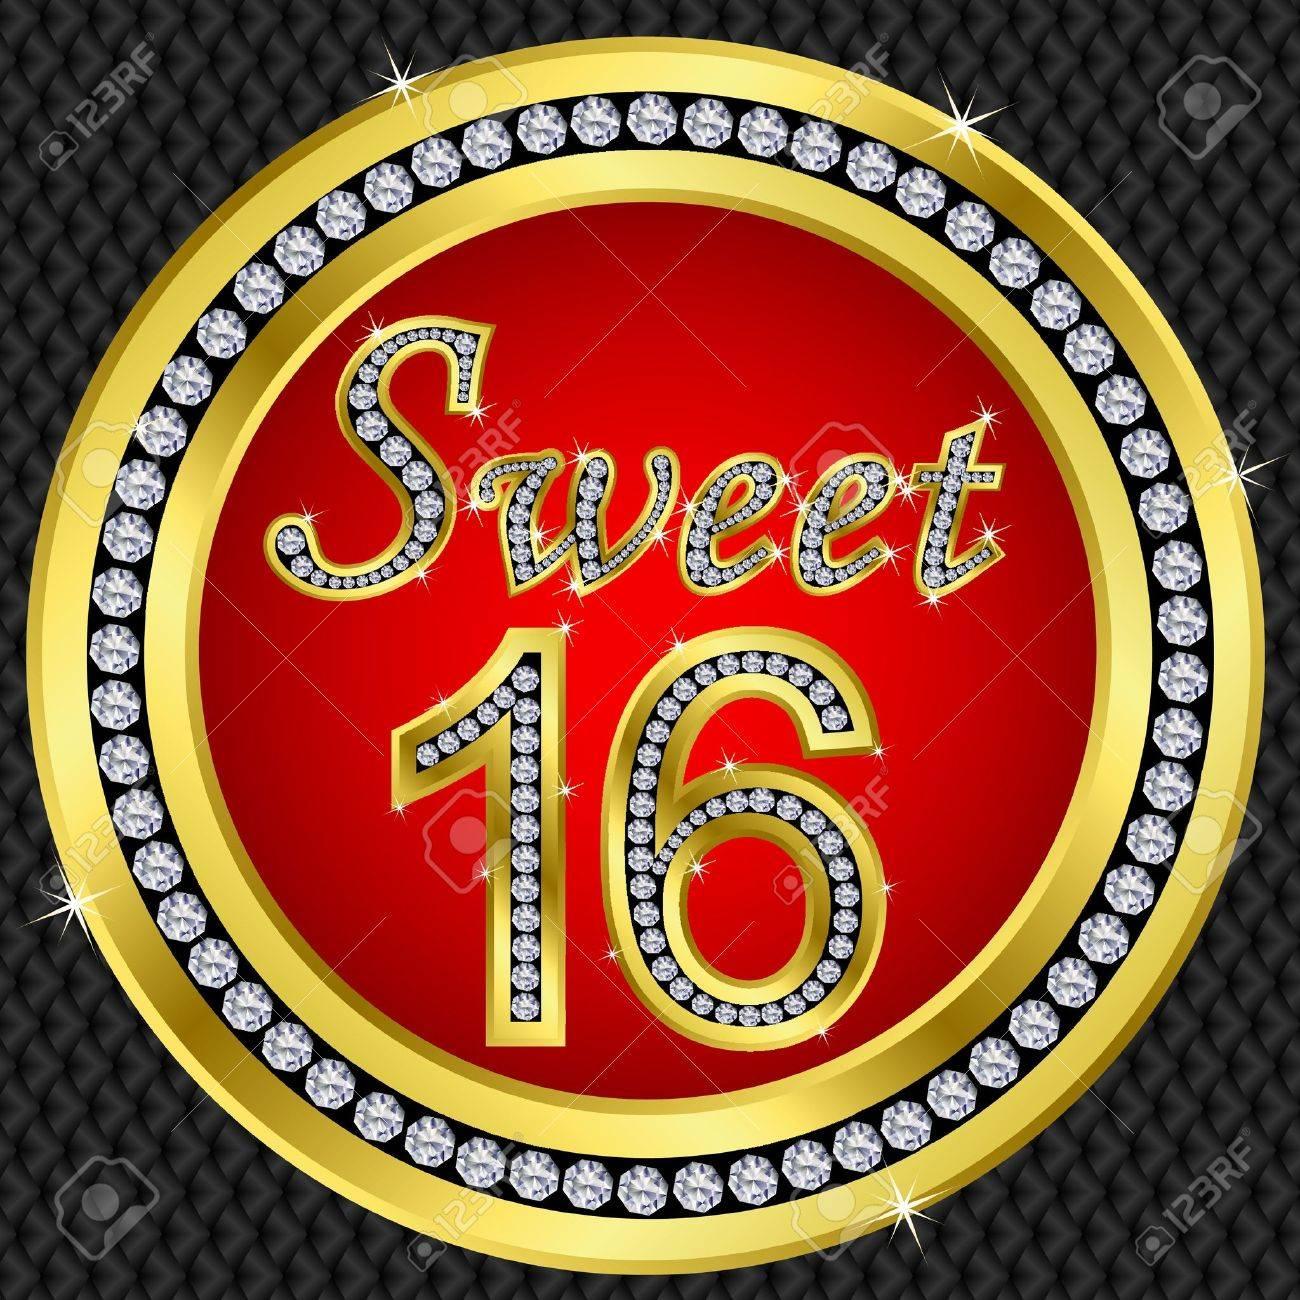 Sweet 16 years anniversary, happy birthday golden icon with diamonds, vector illustration Stock Vector - 11860280